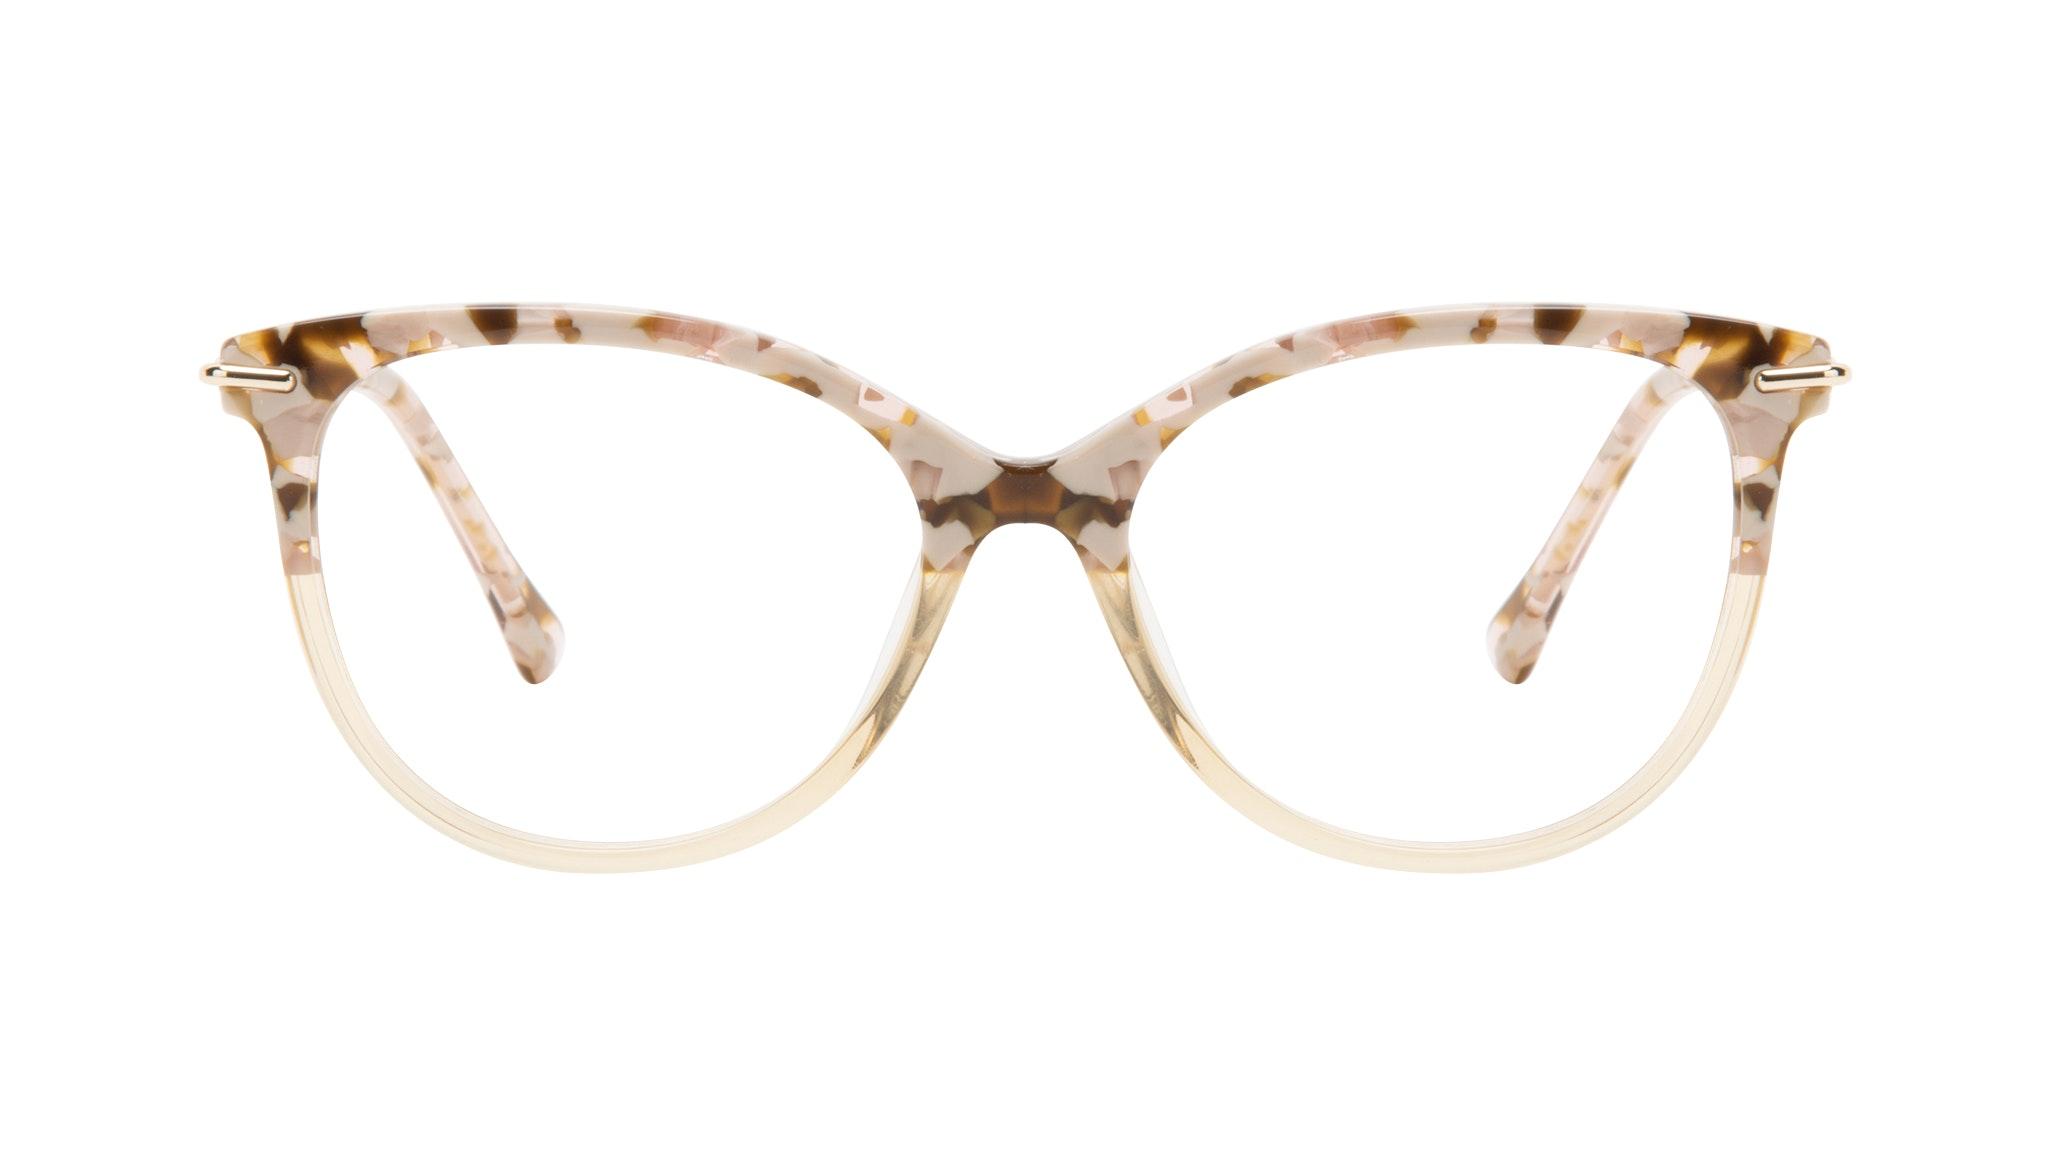 Affordable Fashion Glasses Round Eyeglasses Women Sublime Blond Flake Front